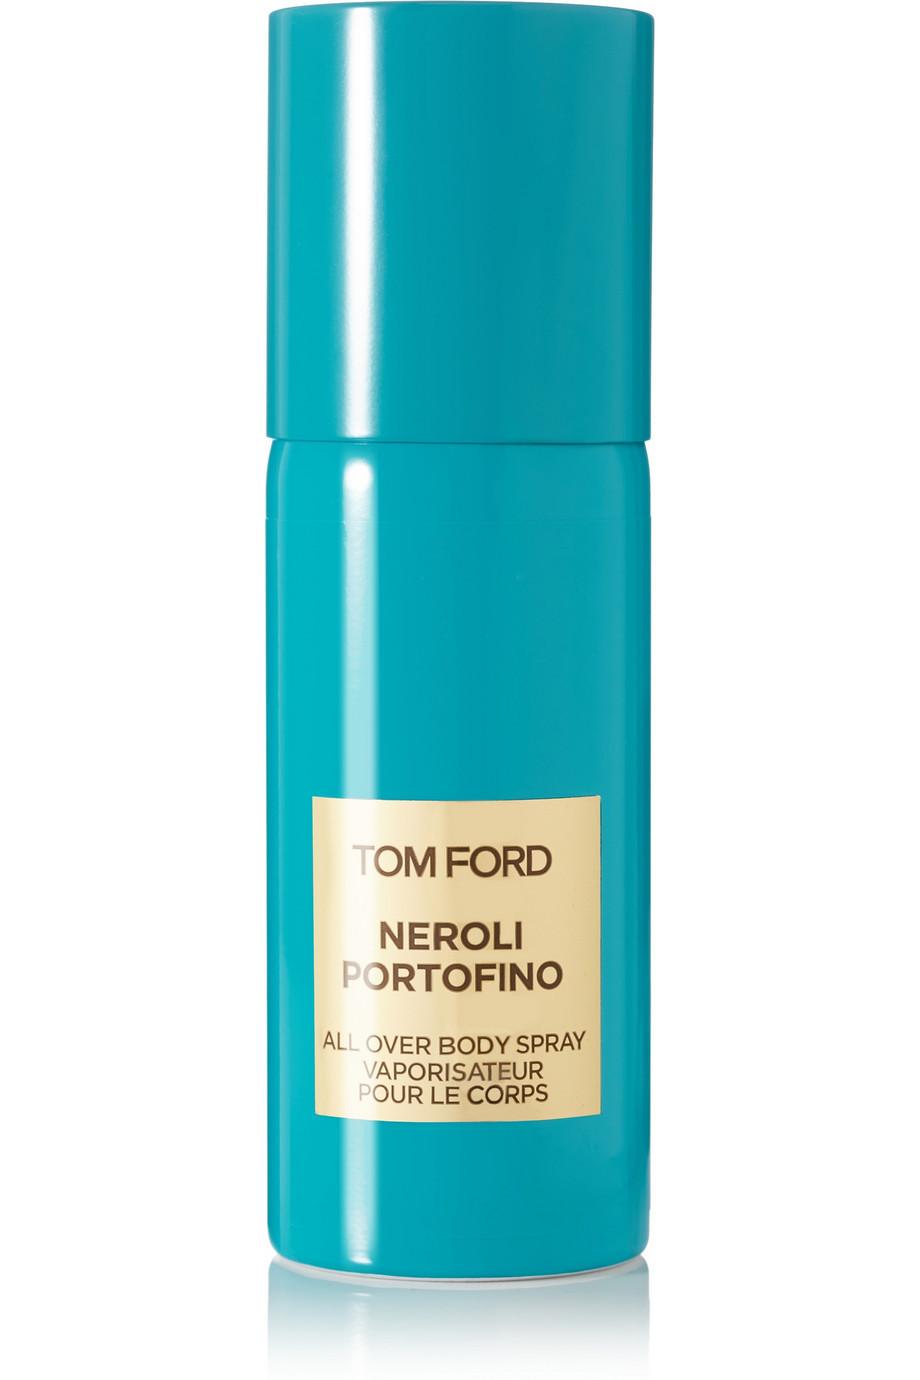 Tom Ford Beauty Neroli Portofino All Over Body Spray